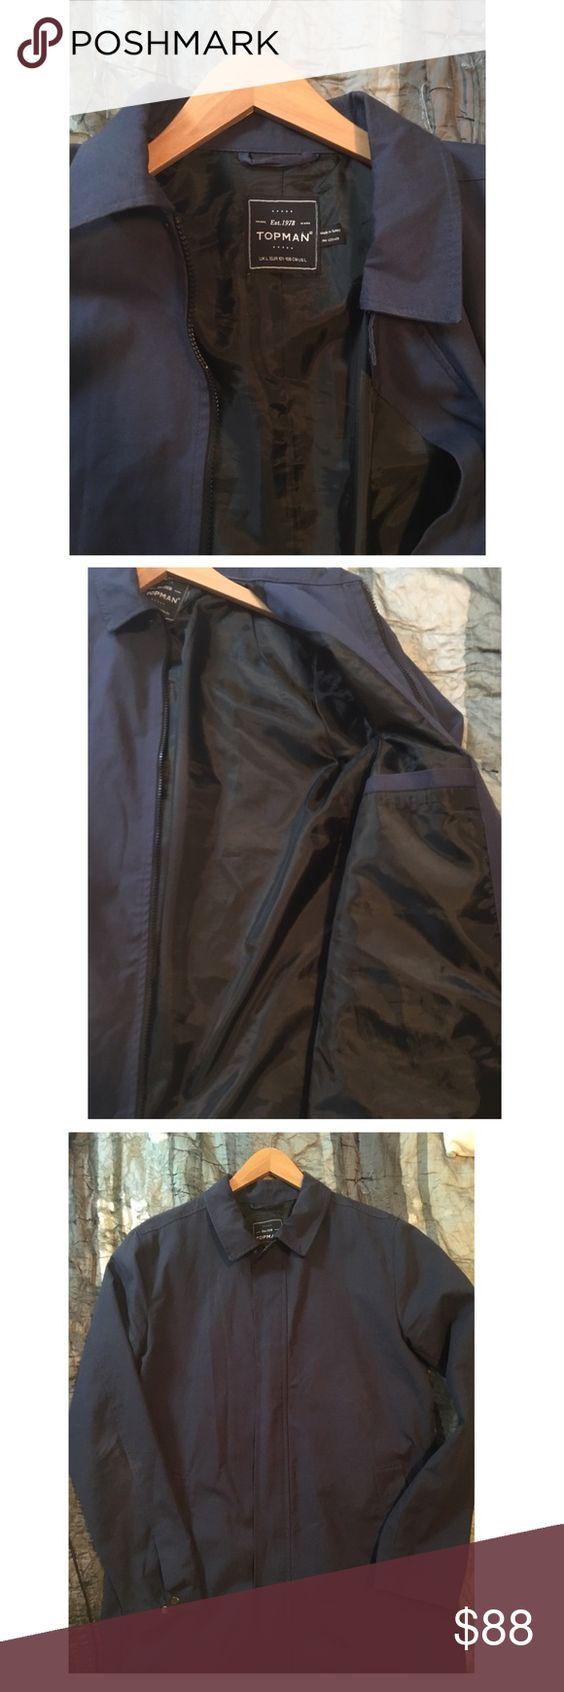 Topman Trenchcoat Cozy navy Topman Trenchcoat great for the fall and winter. Topman Jackets & Coats Trench Coats